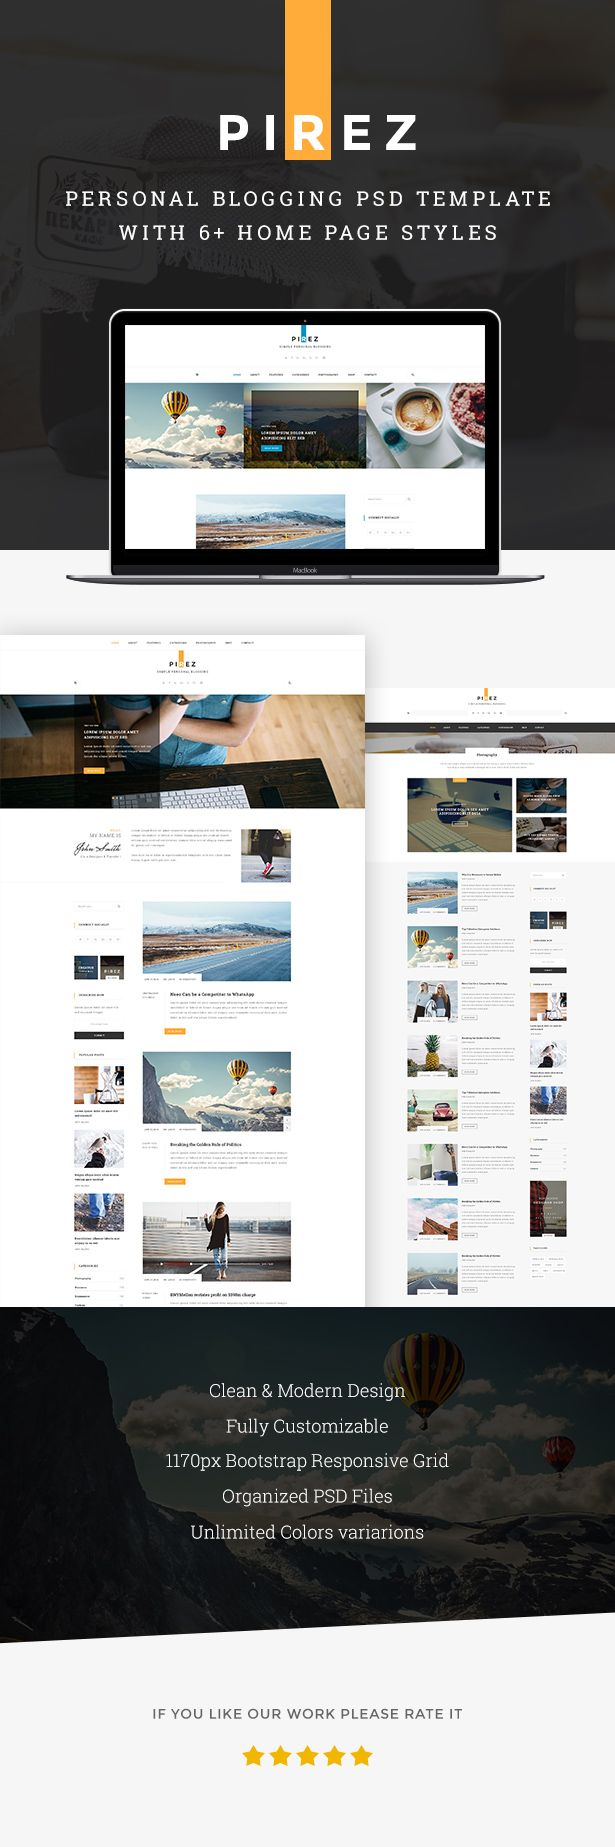 PIREZ - Blogging PSD | Blogging, Psd templates and Template